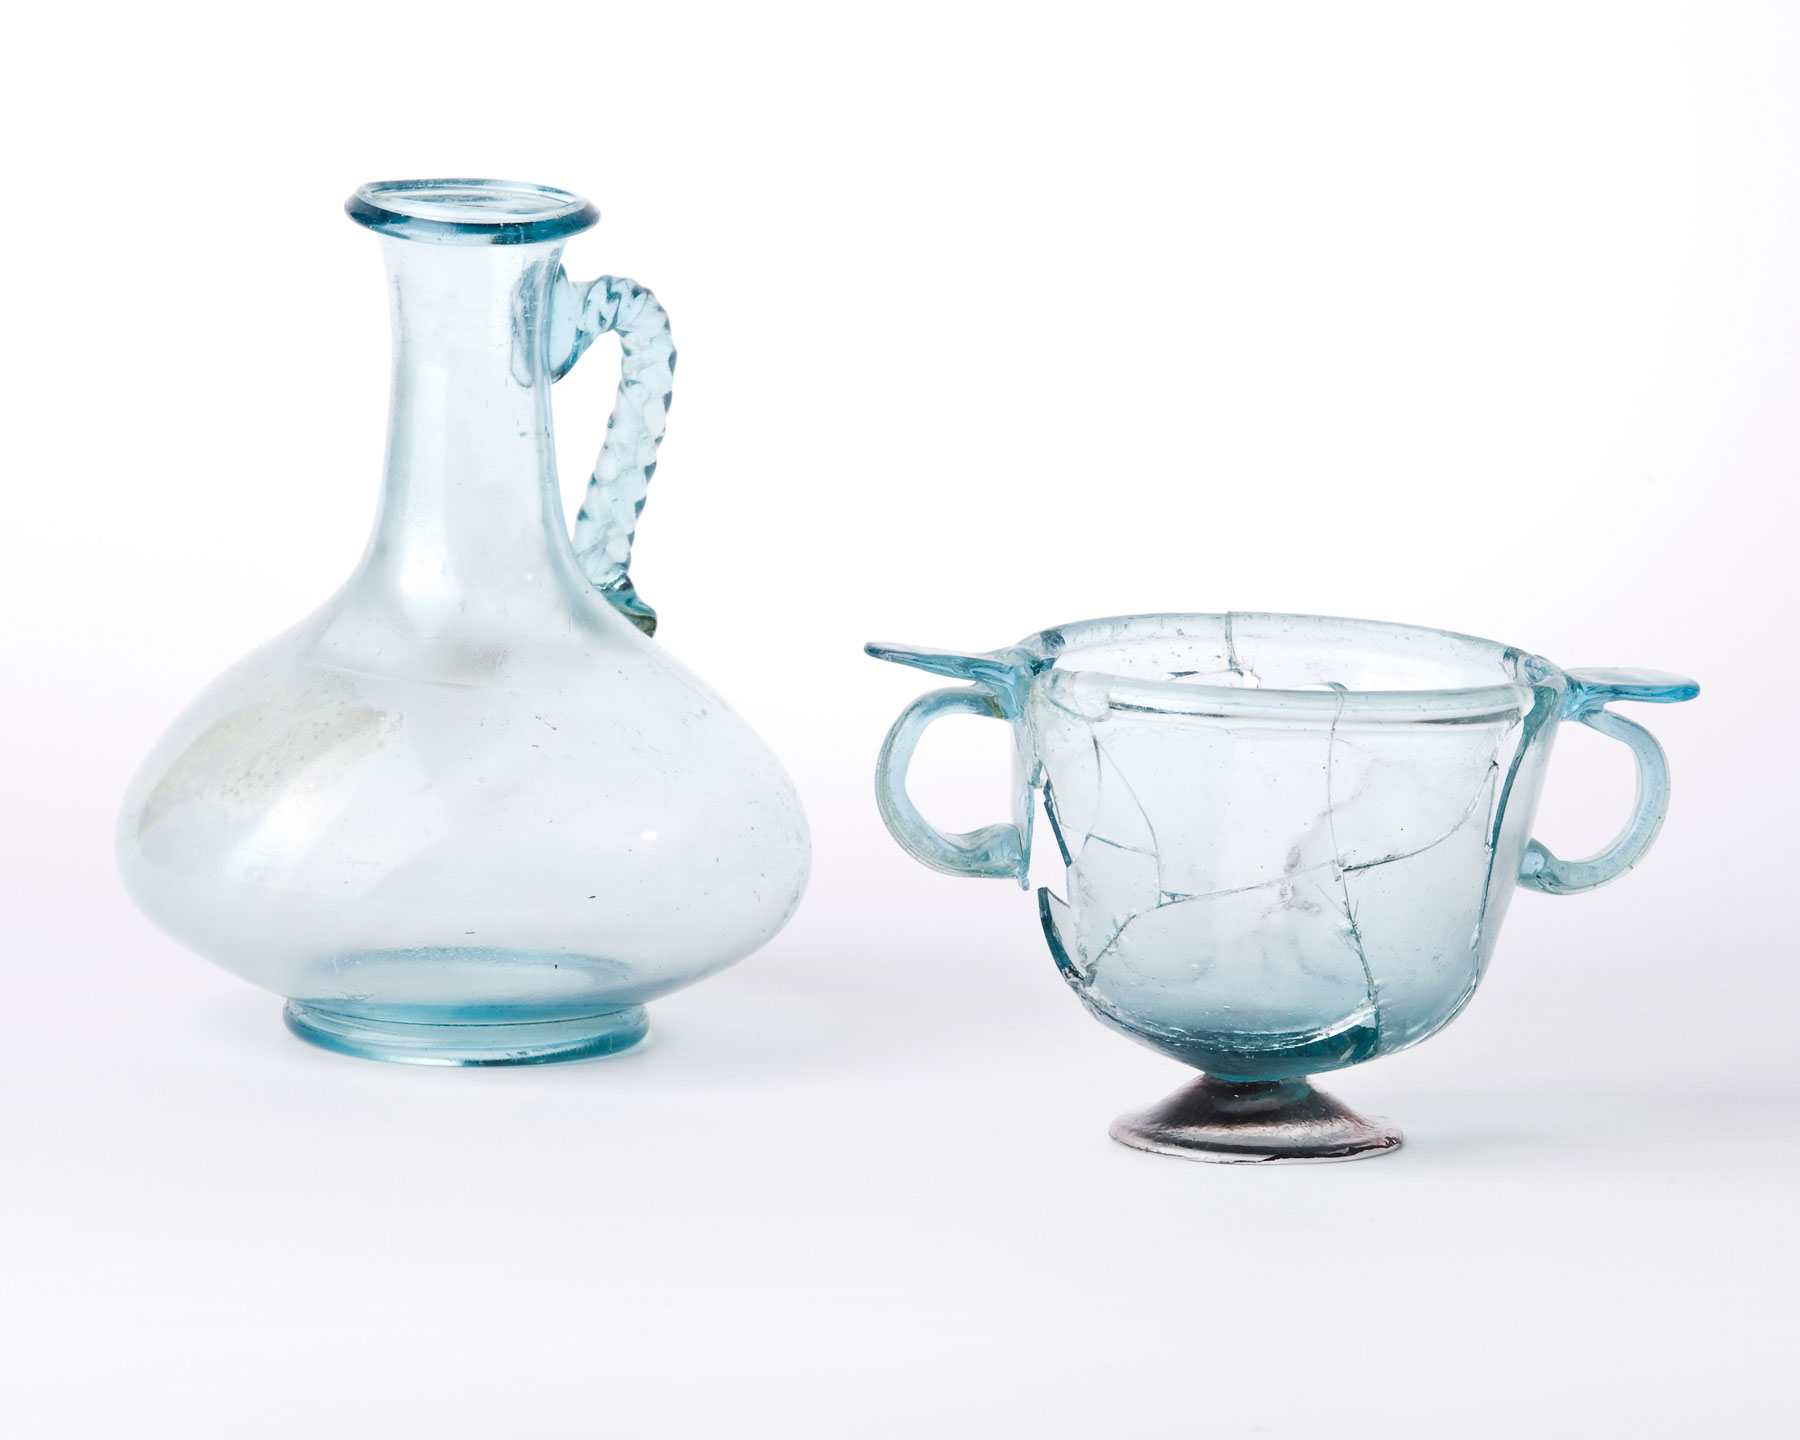 roman glass_5328